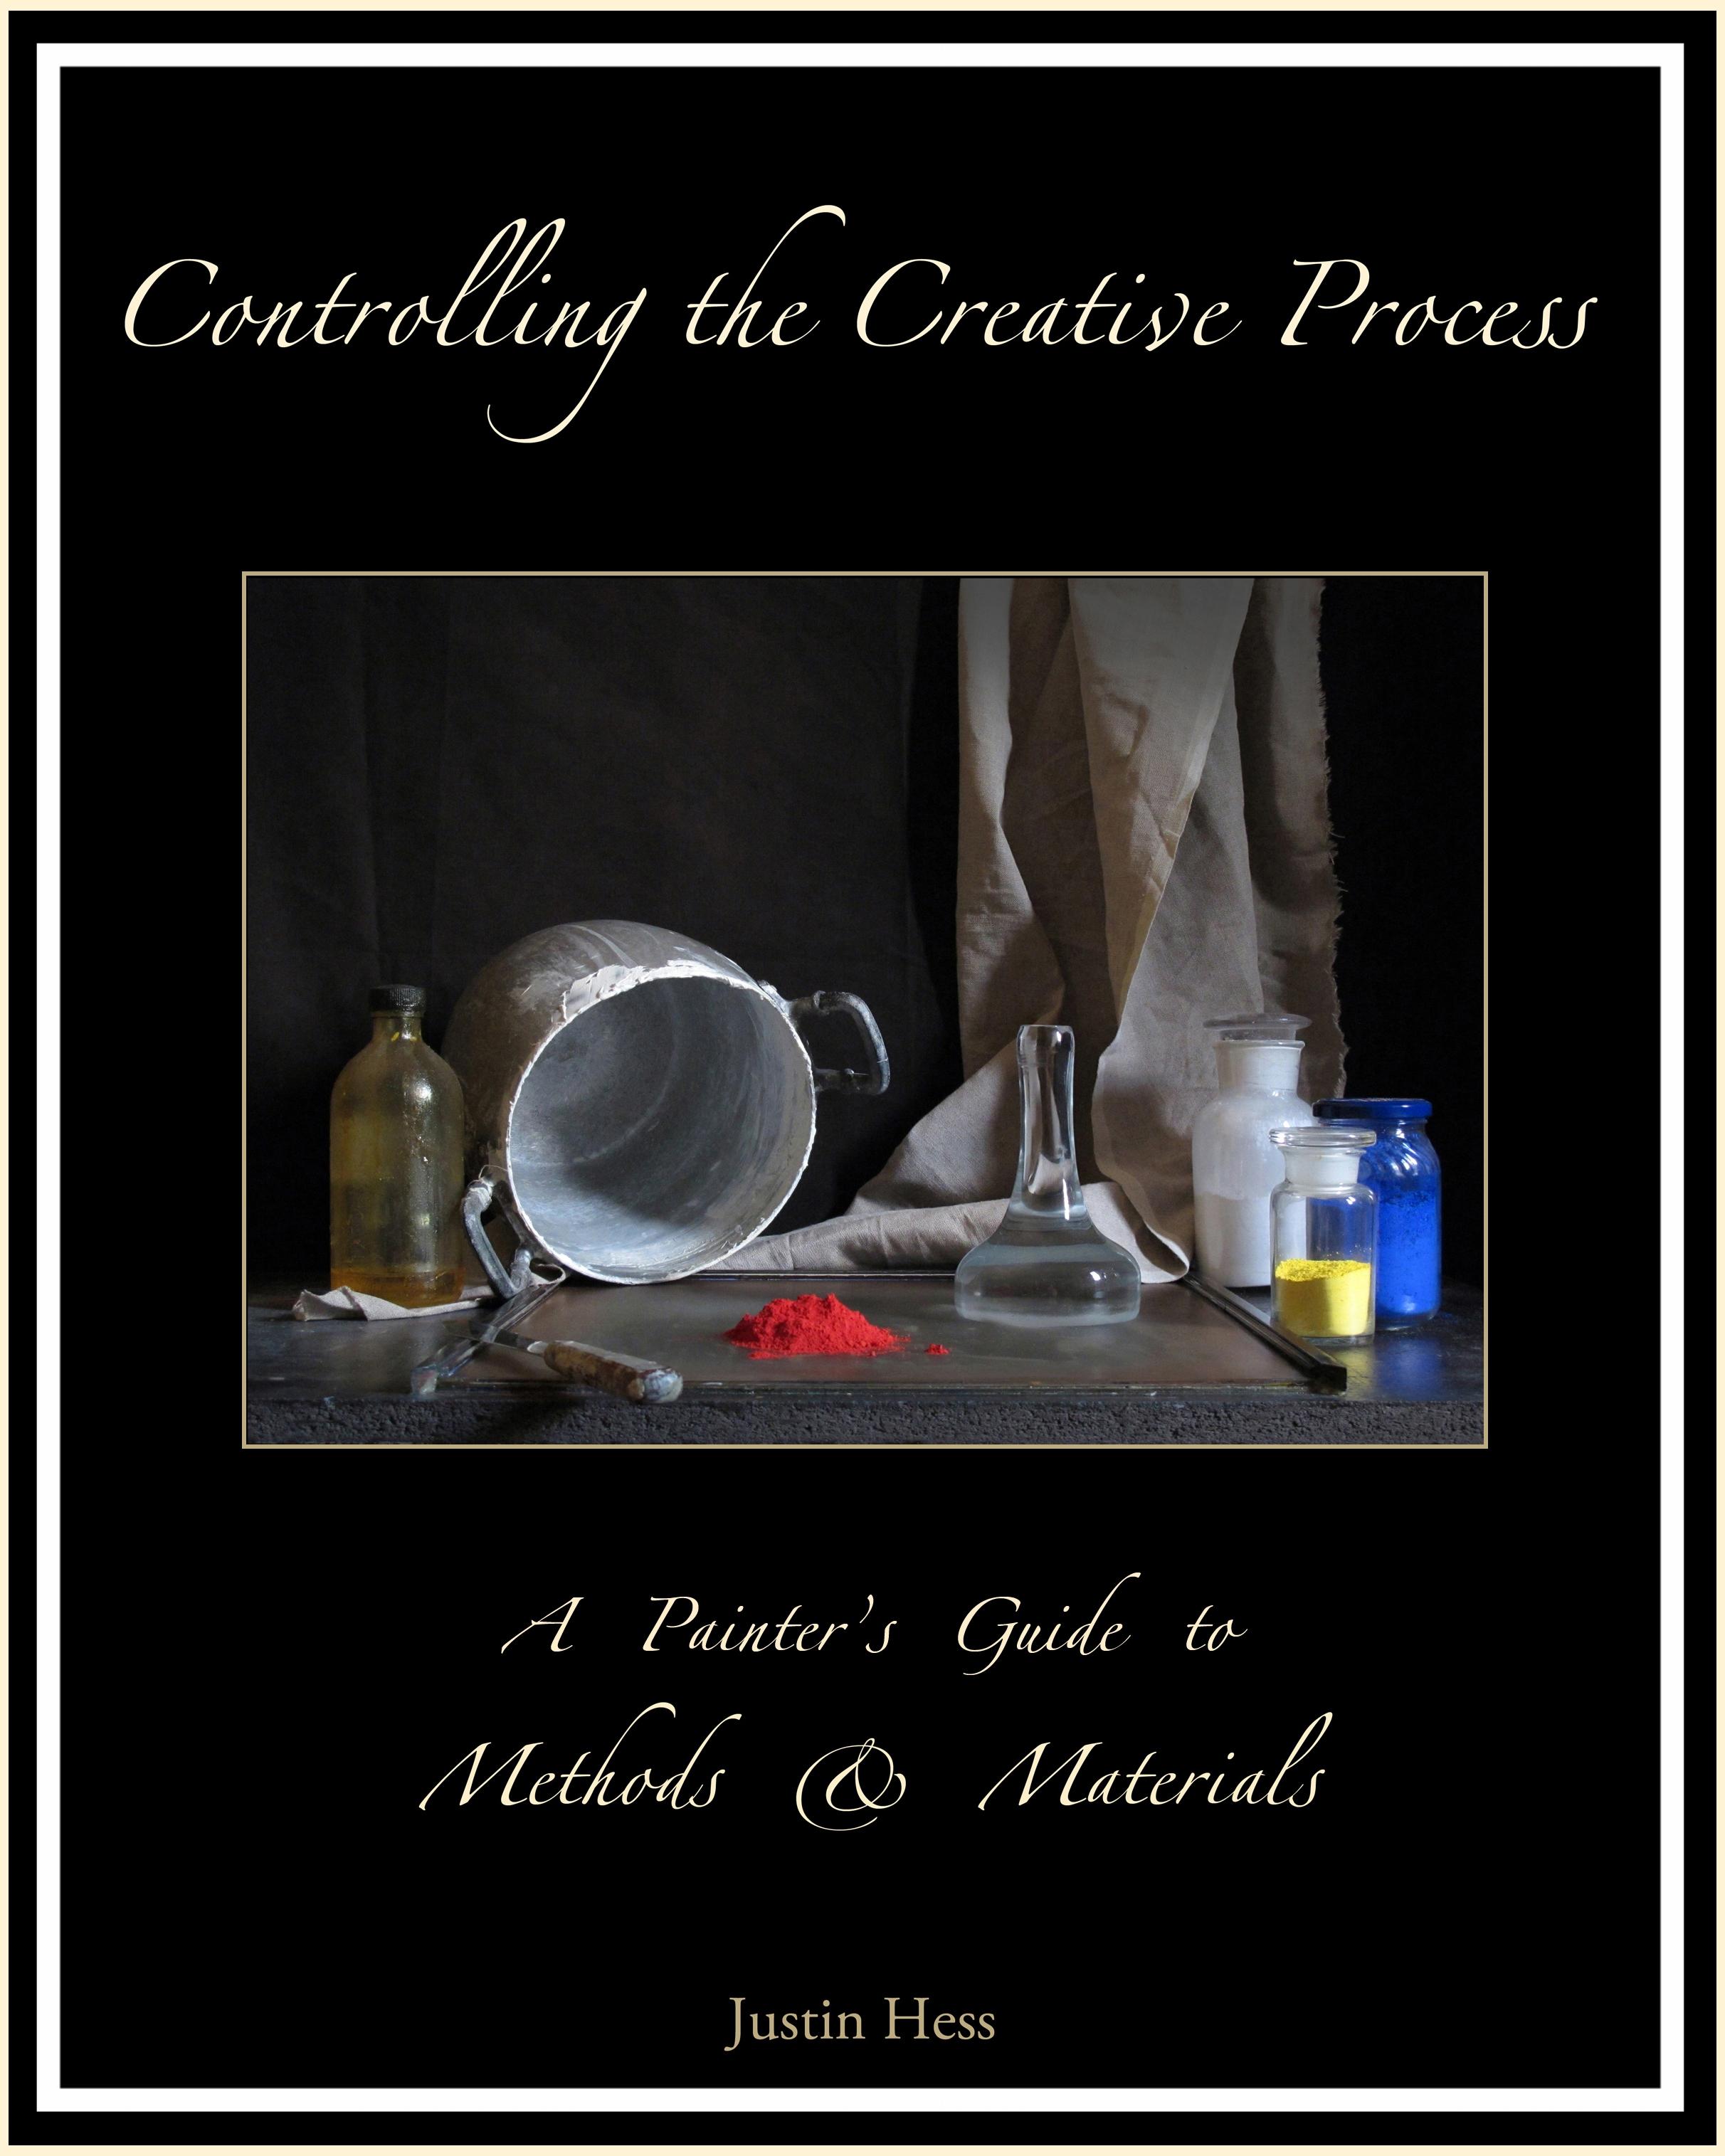 Book Image for link.jpg